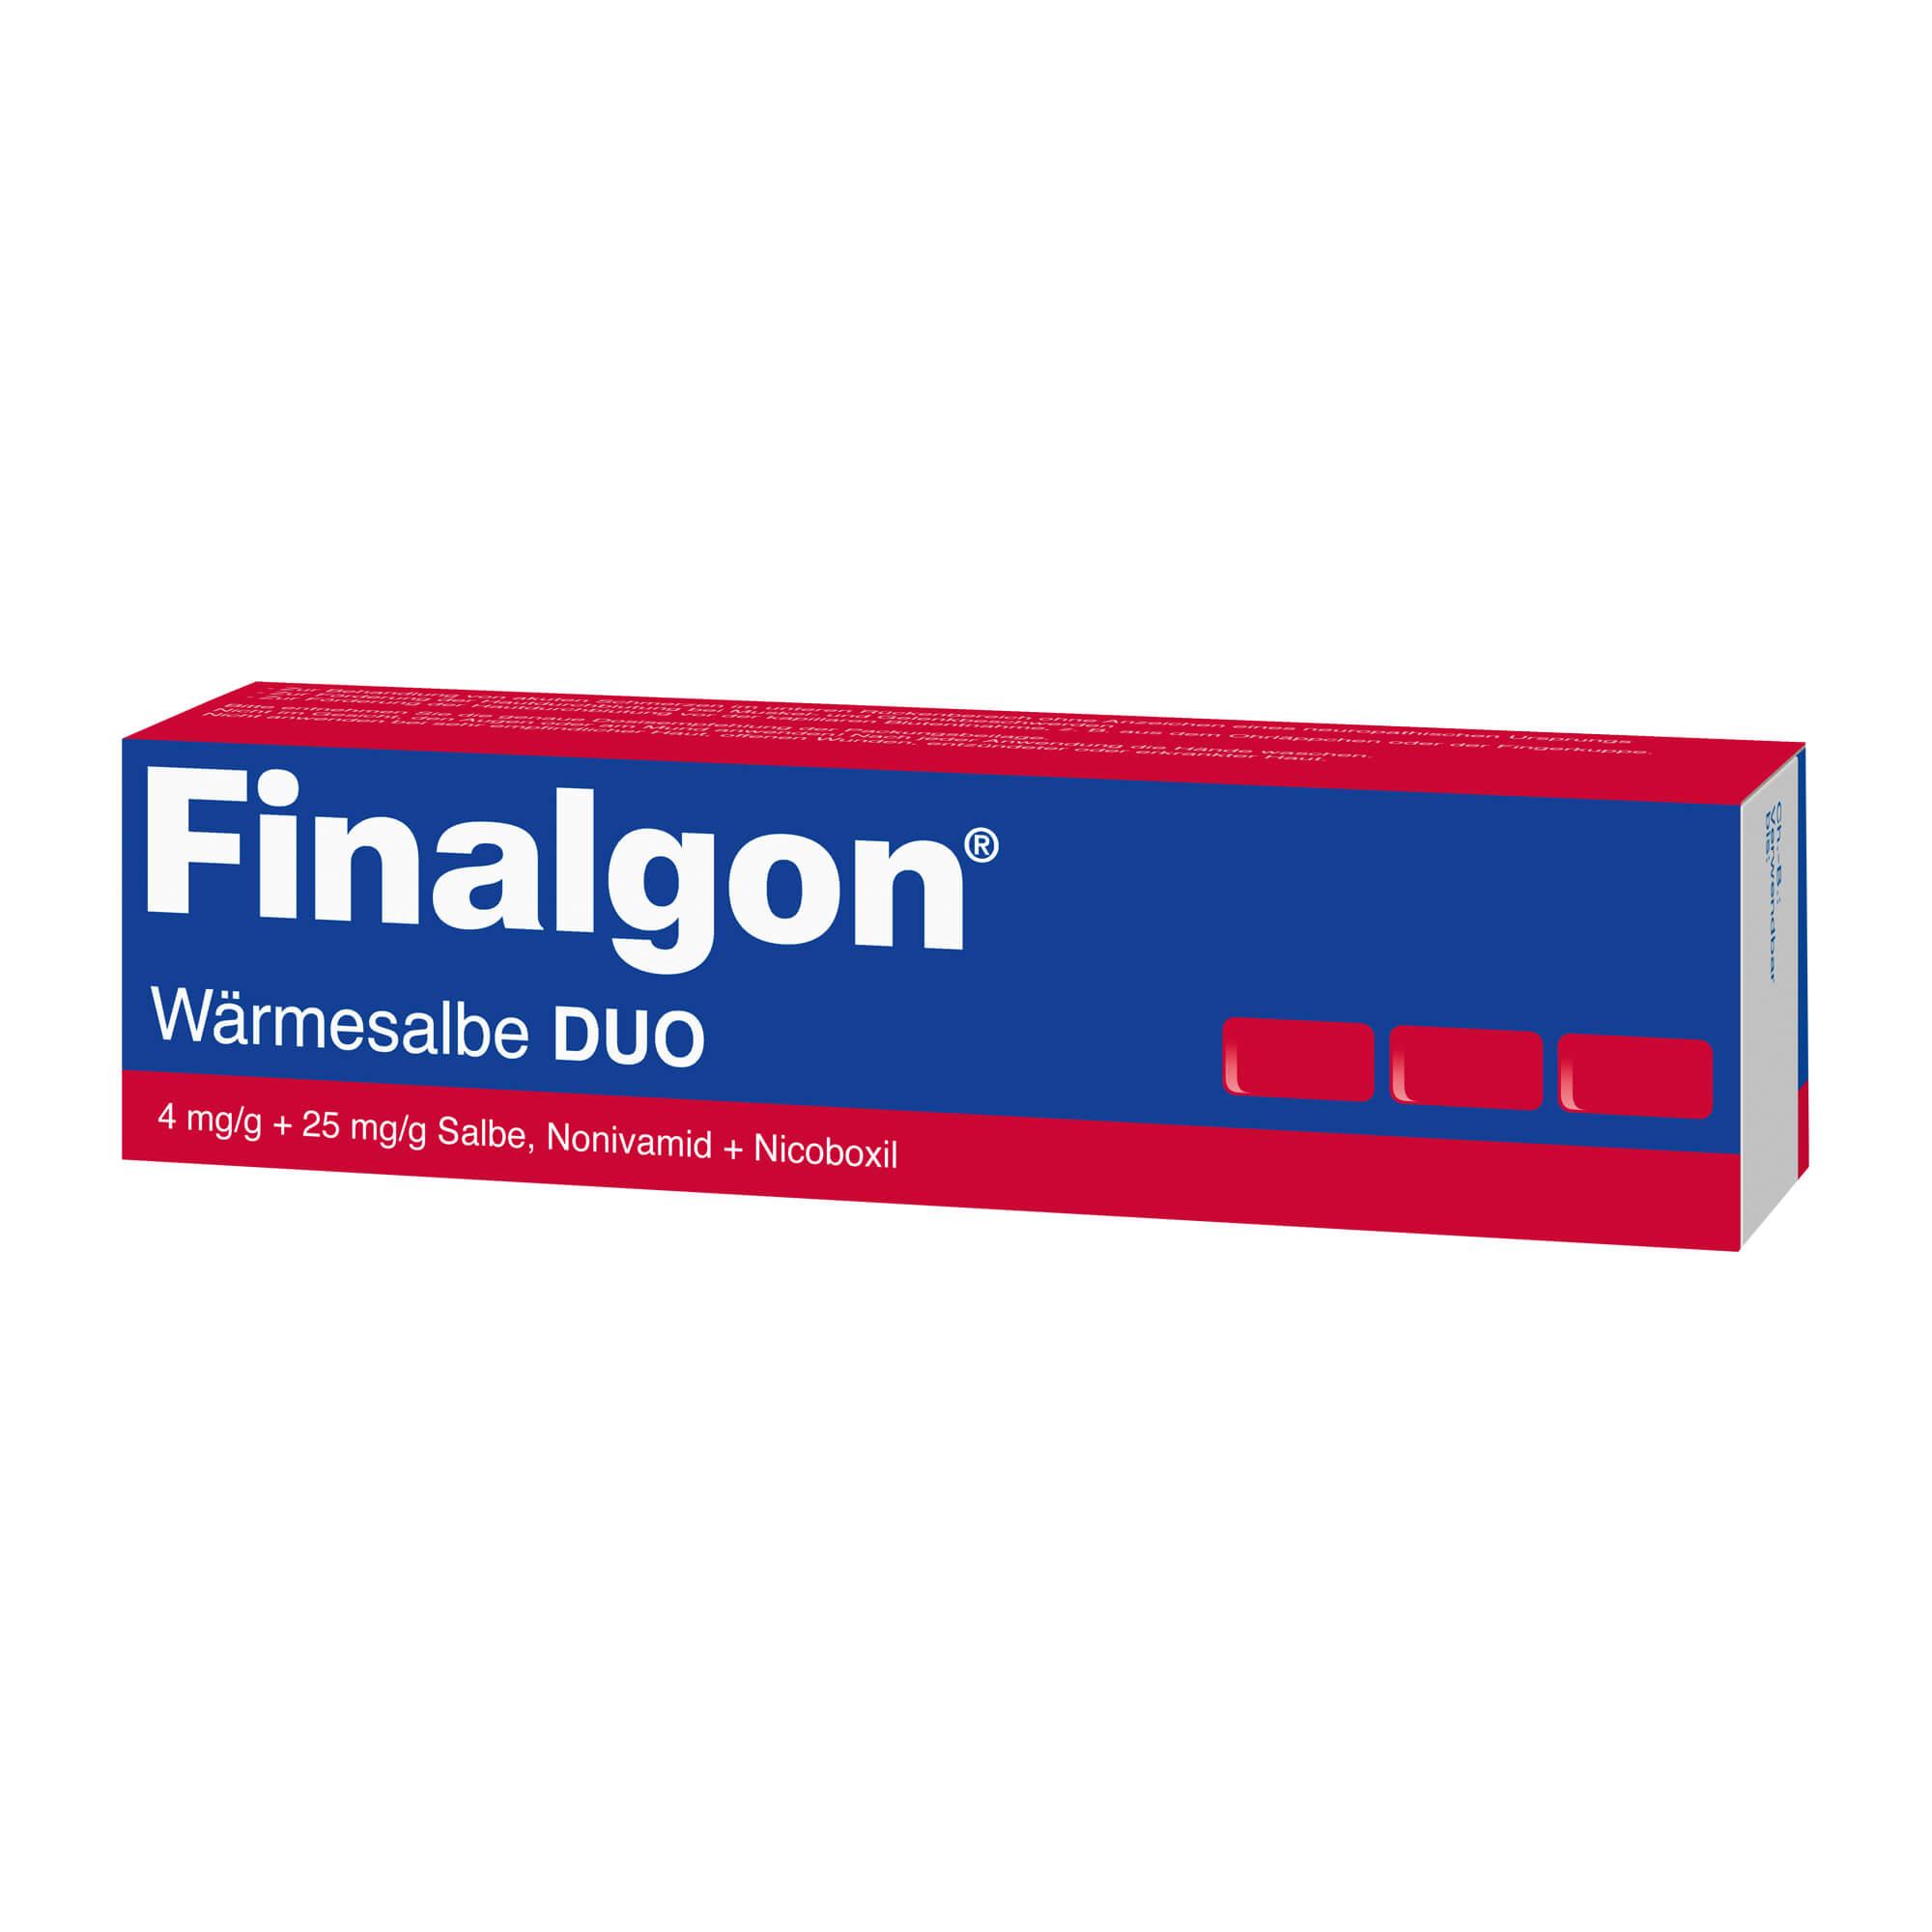 Finalgon Wärmesalbe DUO 4 mg/g + 25 mg/g